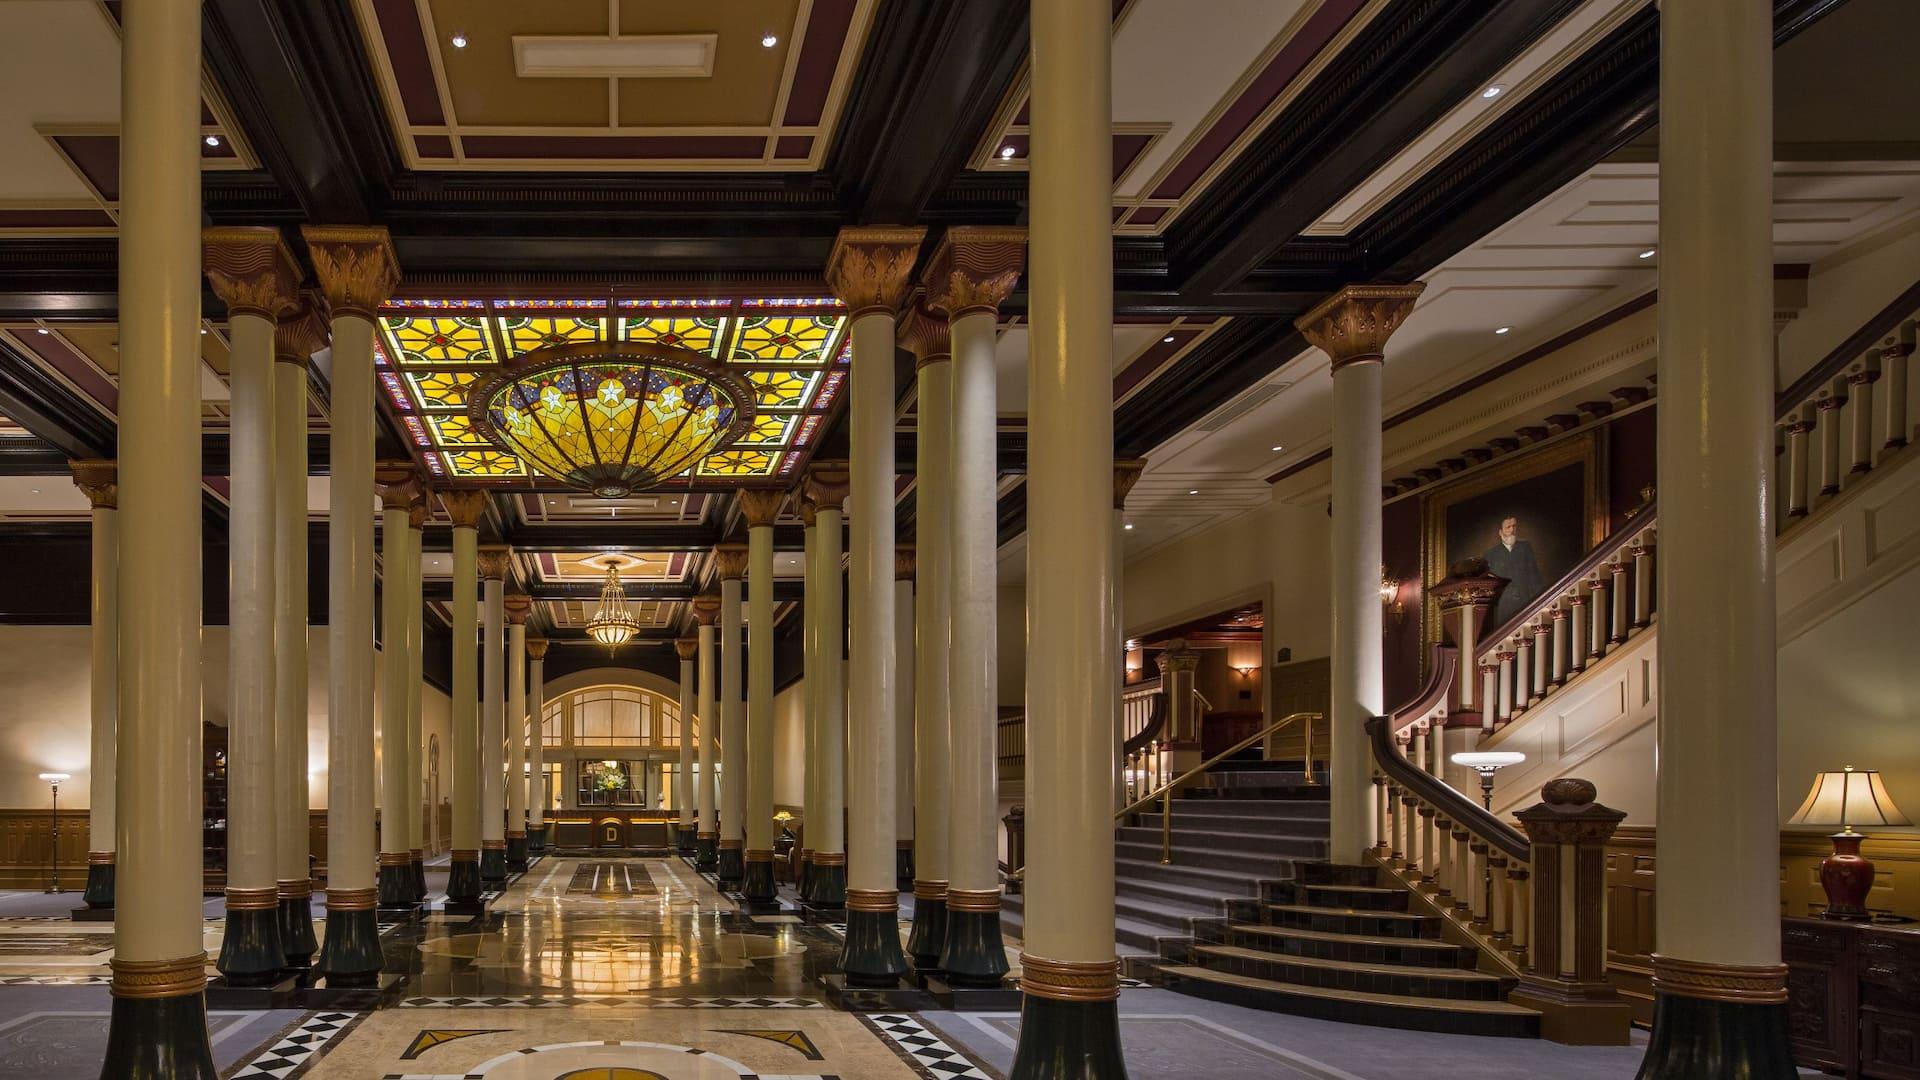 Hotel Atrium The Driskill